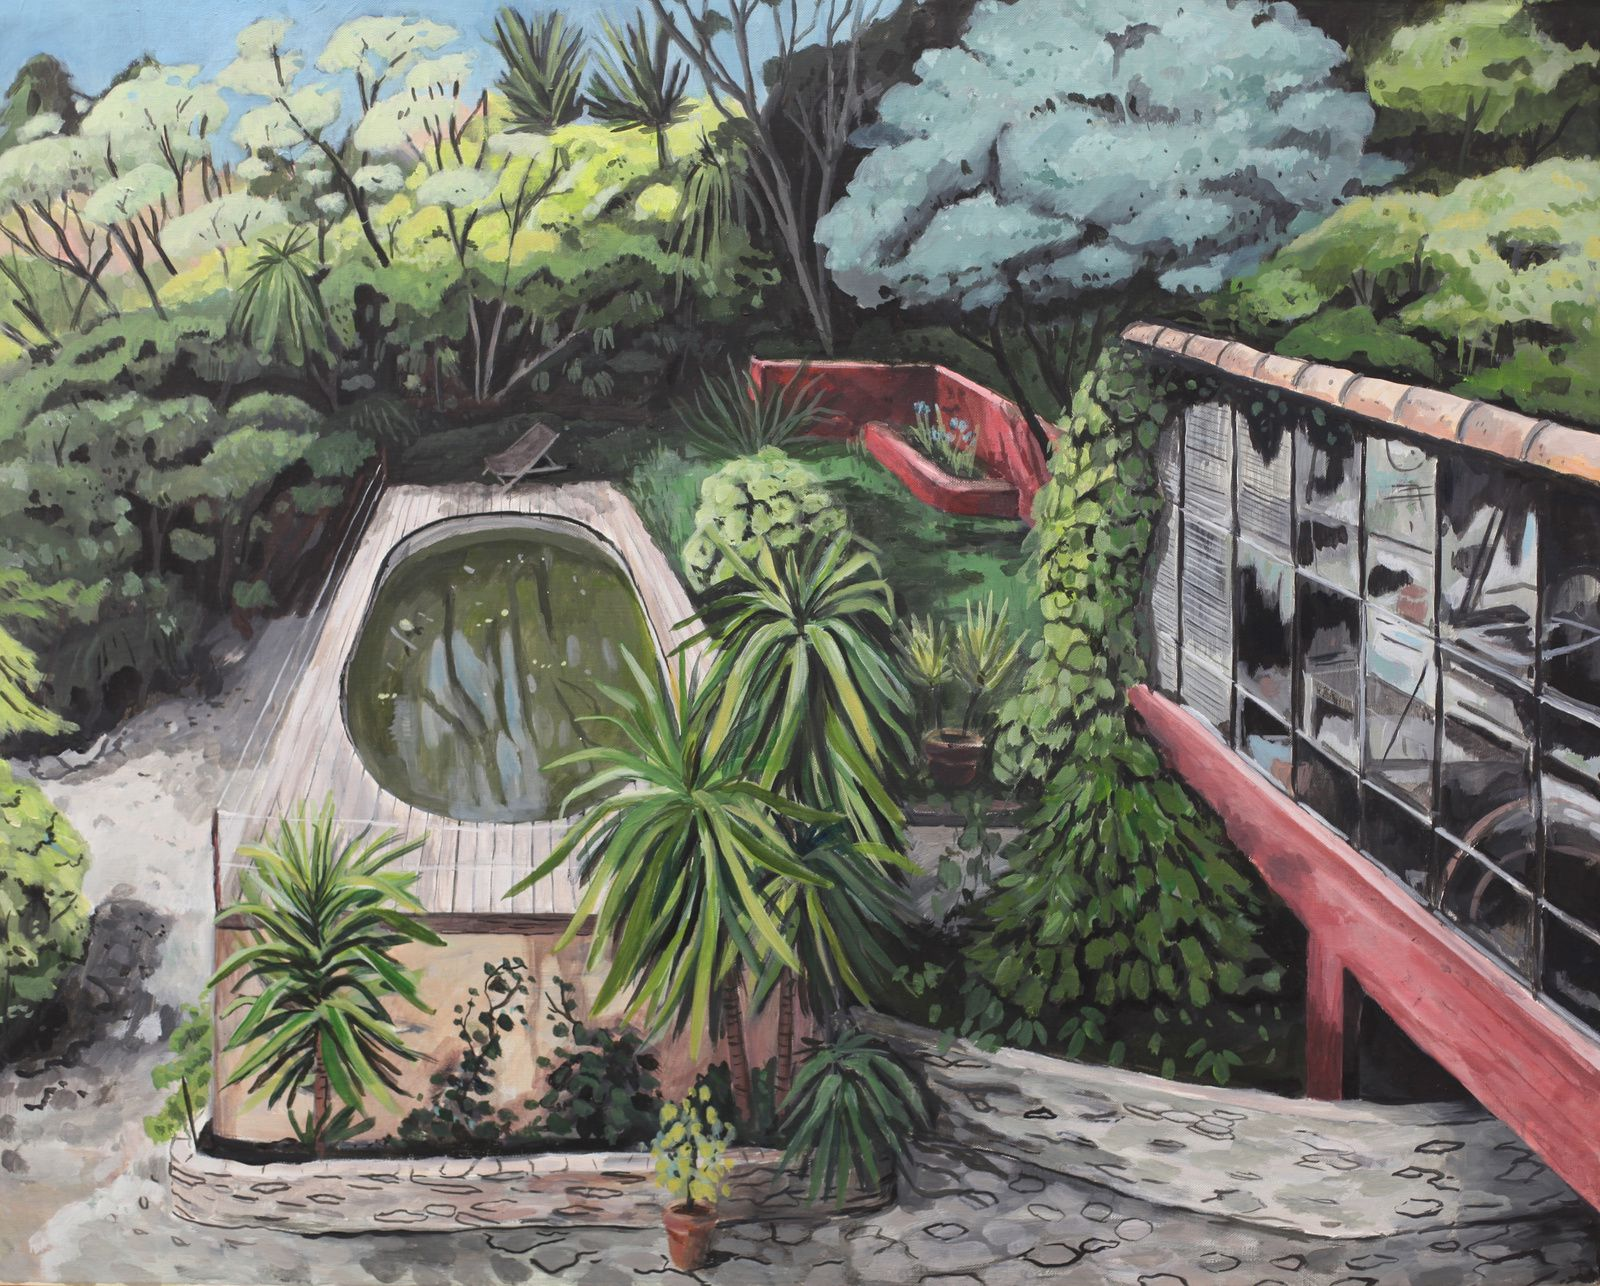 """Le jardin de Bruno"", 2015 d'Antoine Corbineau - Courtesy Galerie LJ © Photo Éric Simon"